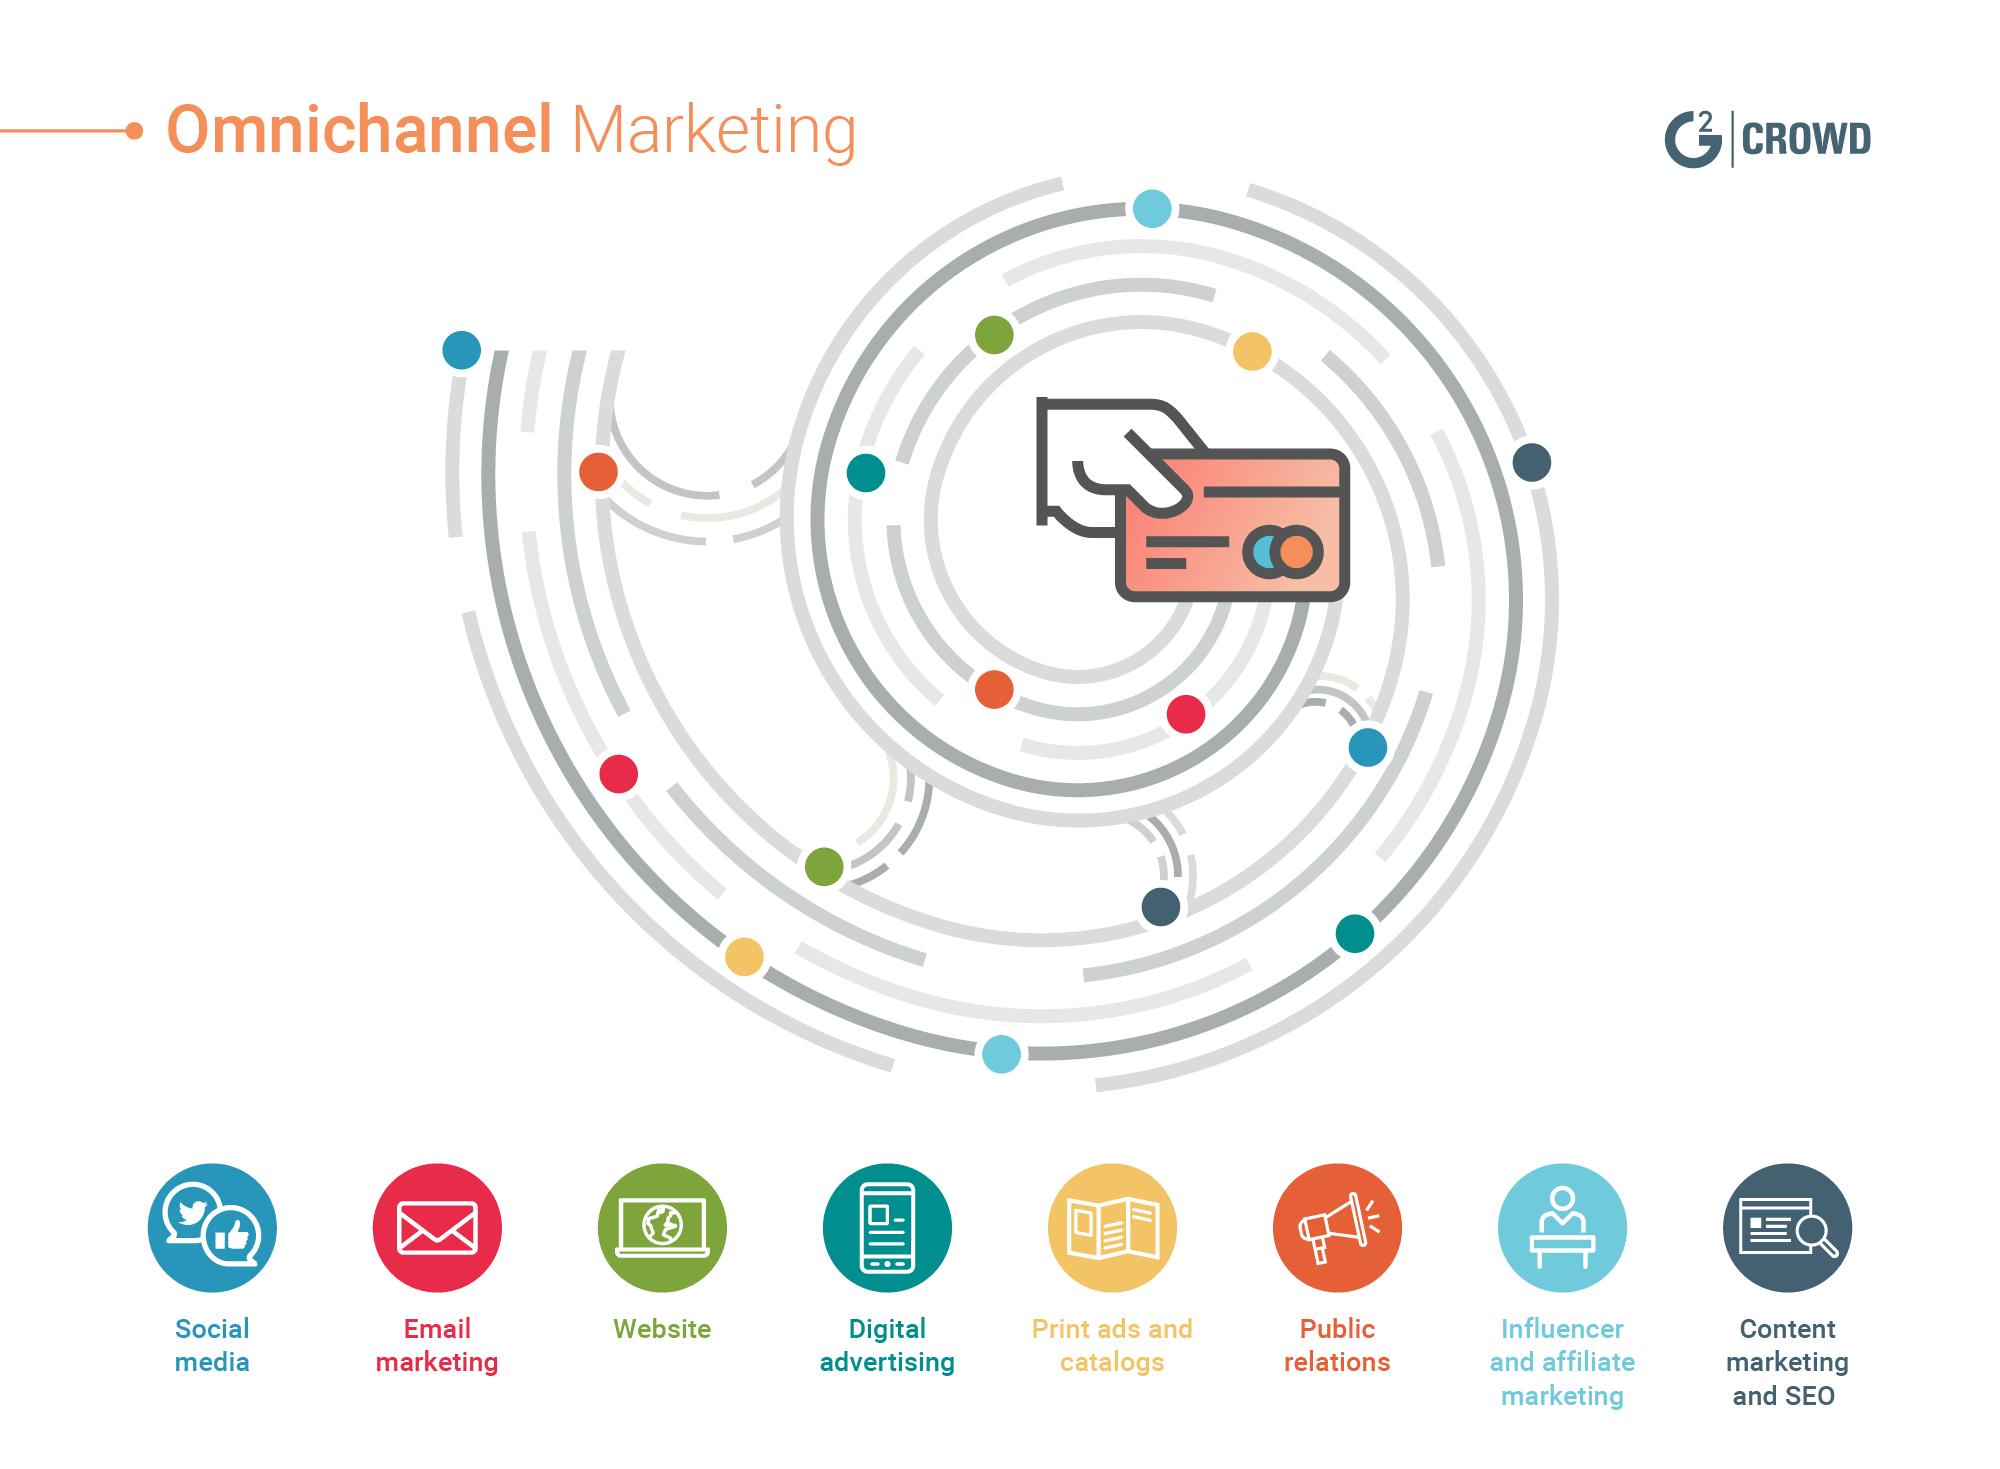 omnichannel marketing strategies